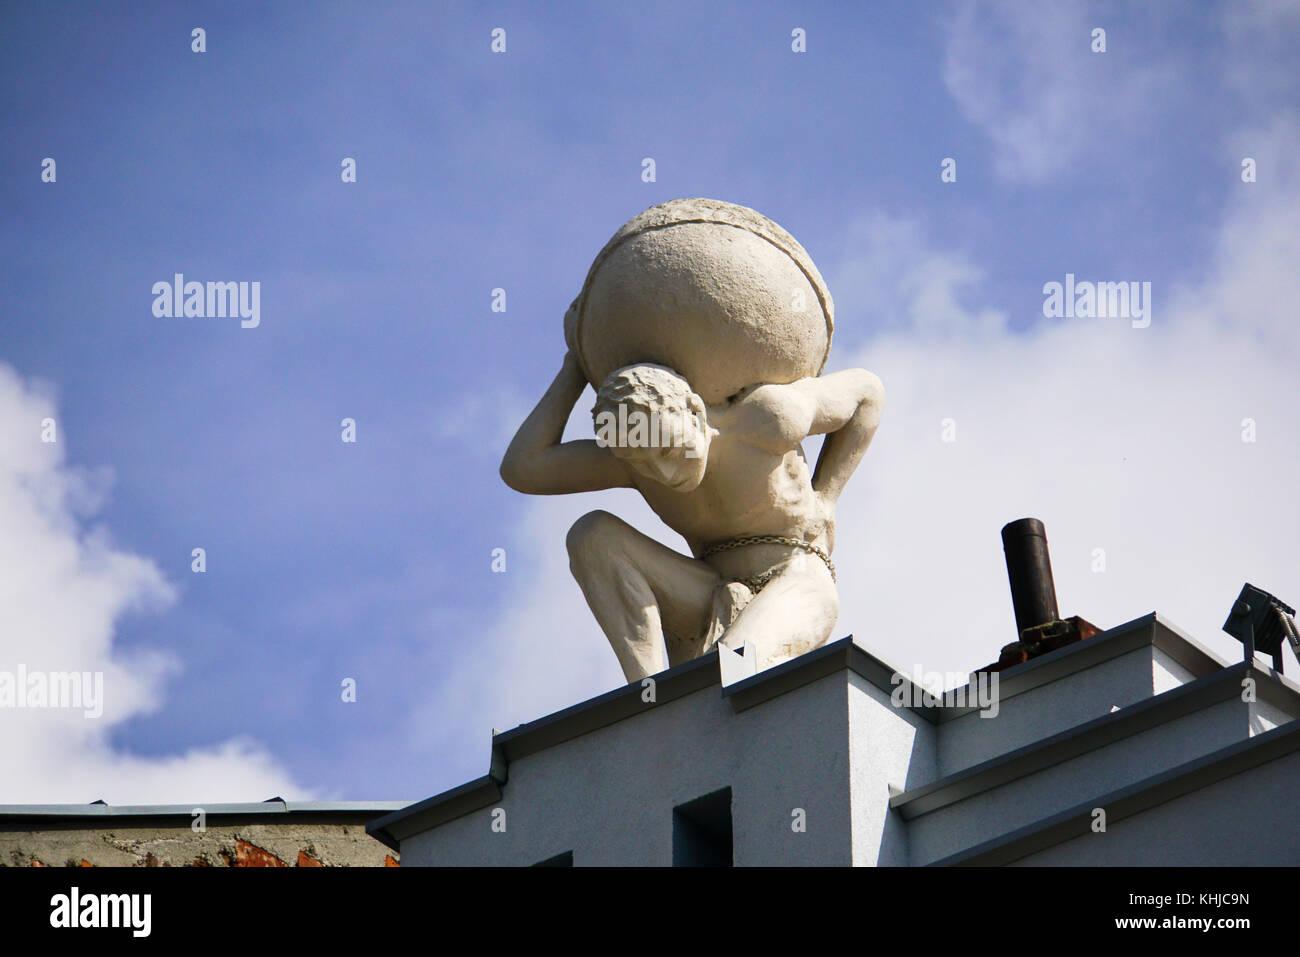 Atlas Sculpture Old Building In Stock Photos & Atlas